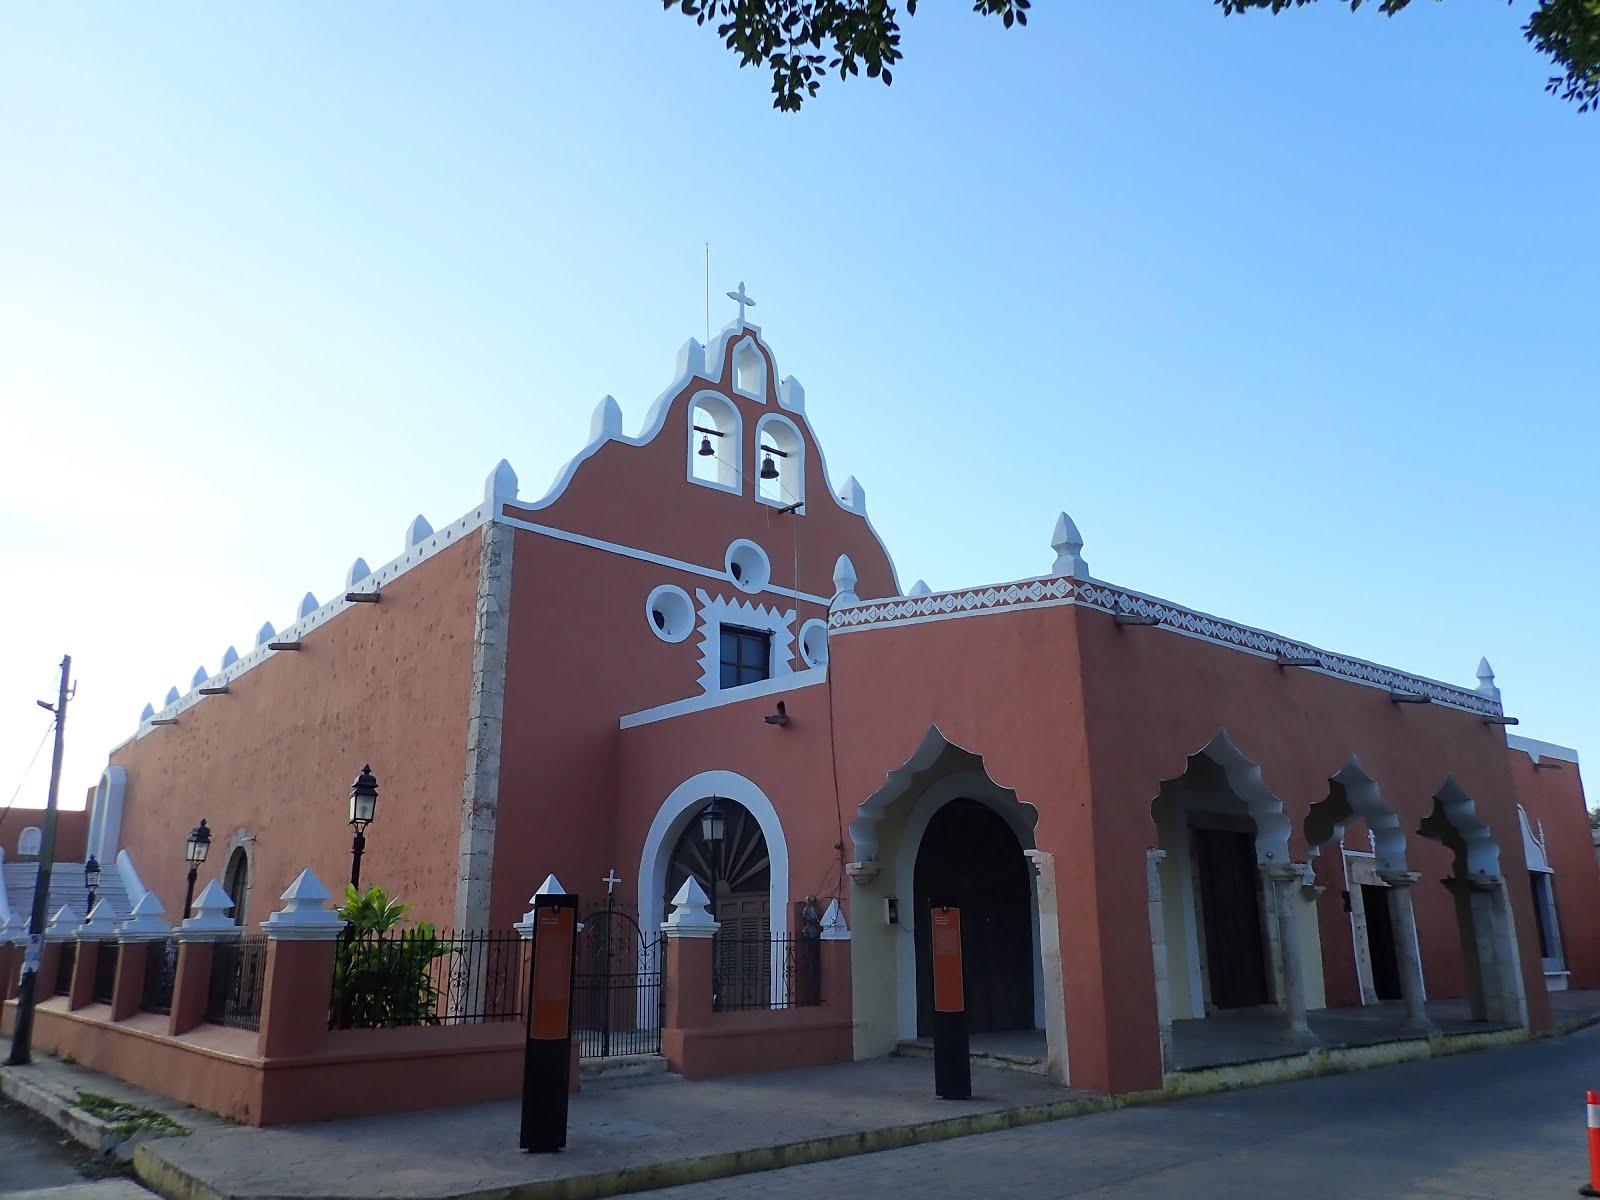 iglesia de la candelaria à valladolid